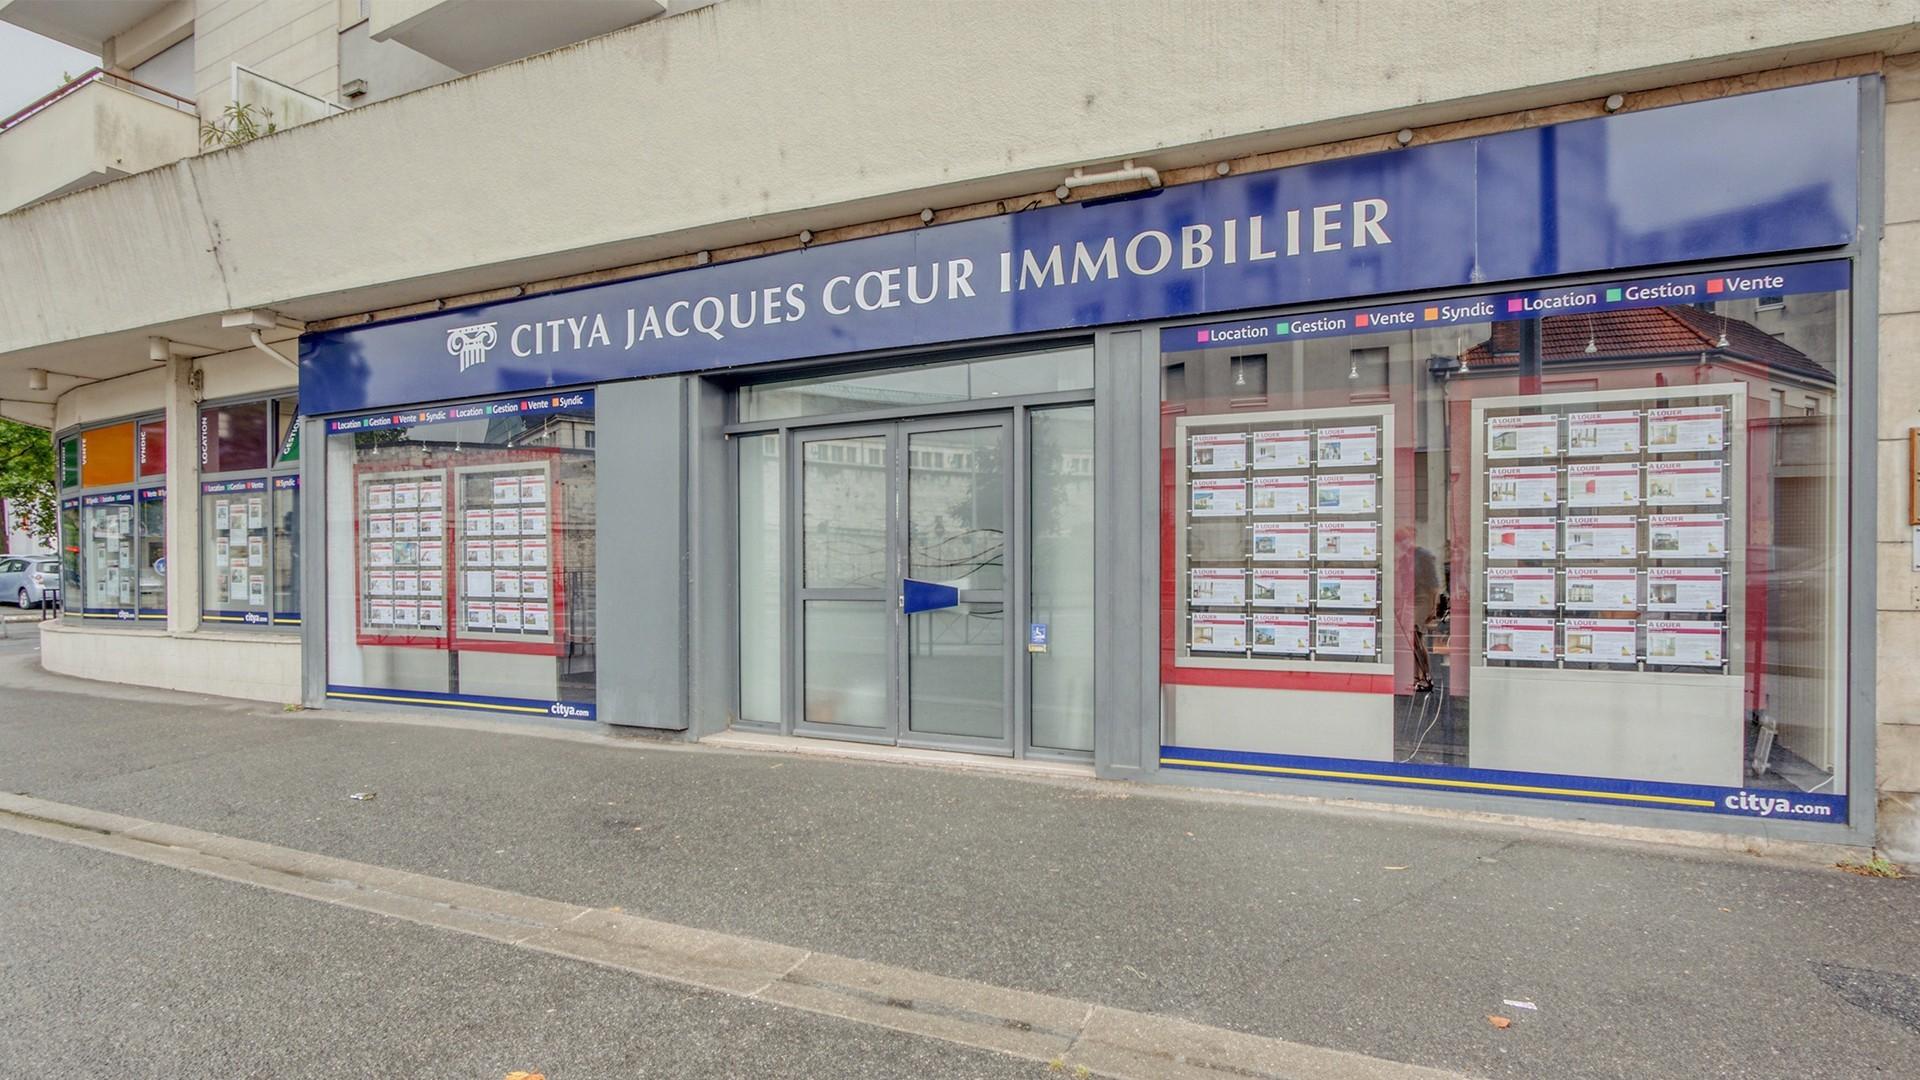 Agence immo Citya Jacques Cœur